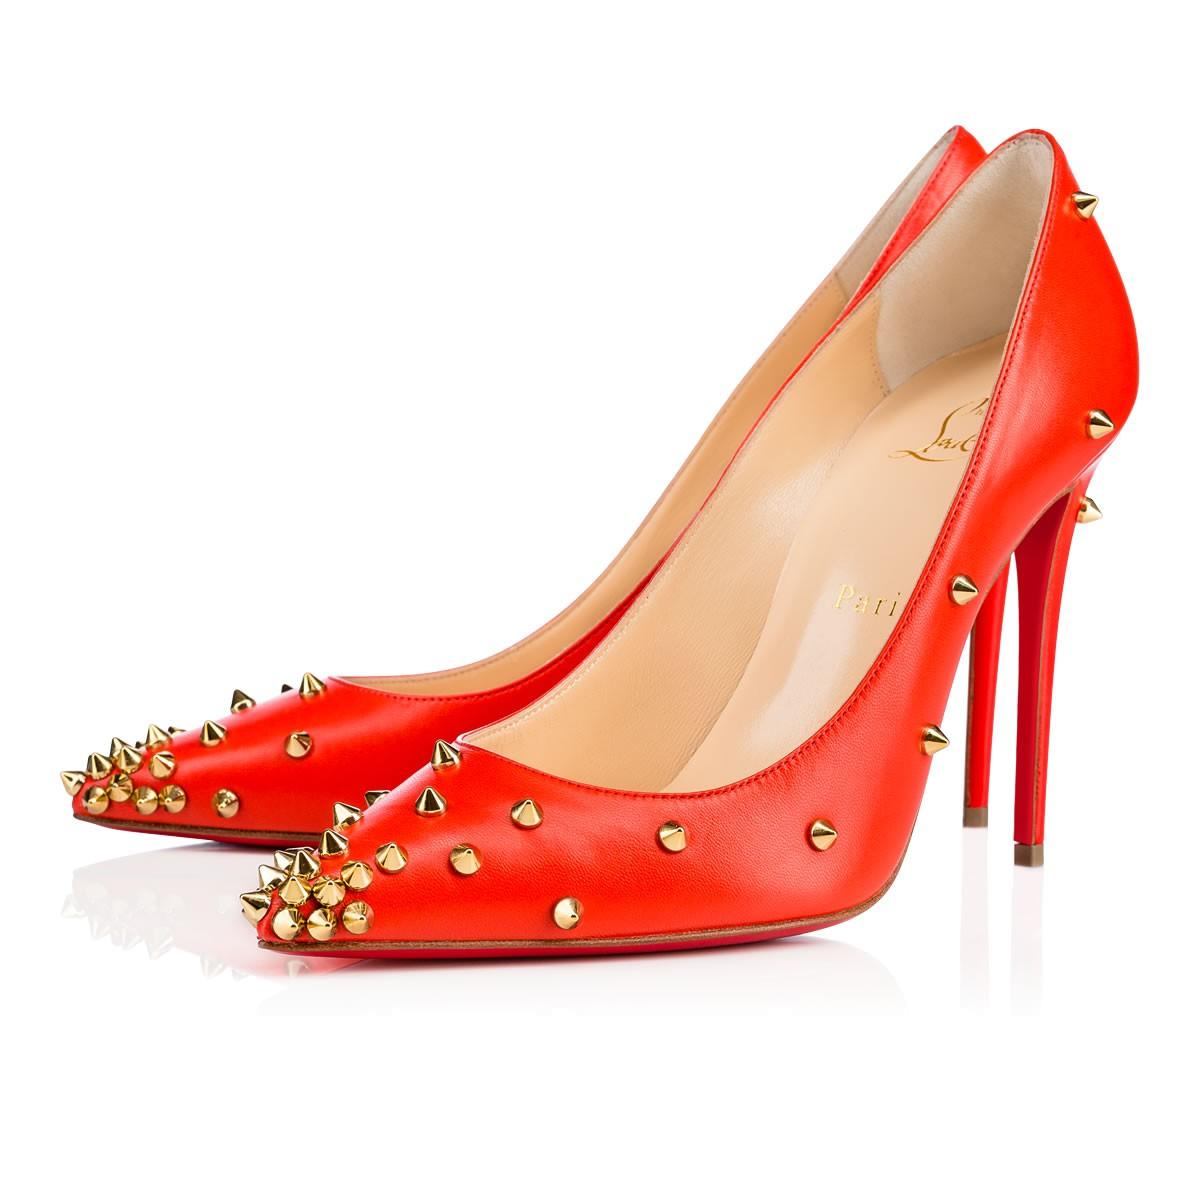 Красные туфли лабутены Degraspike